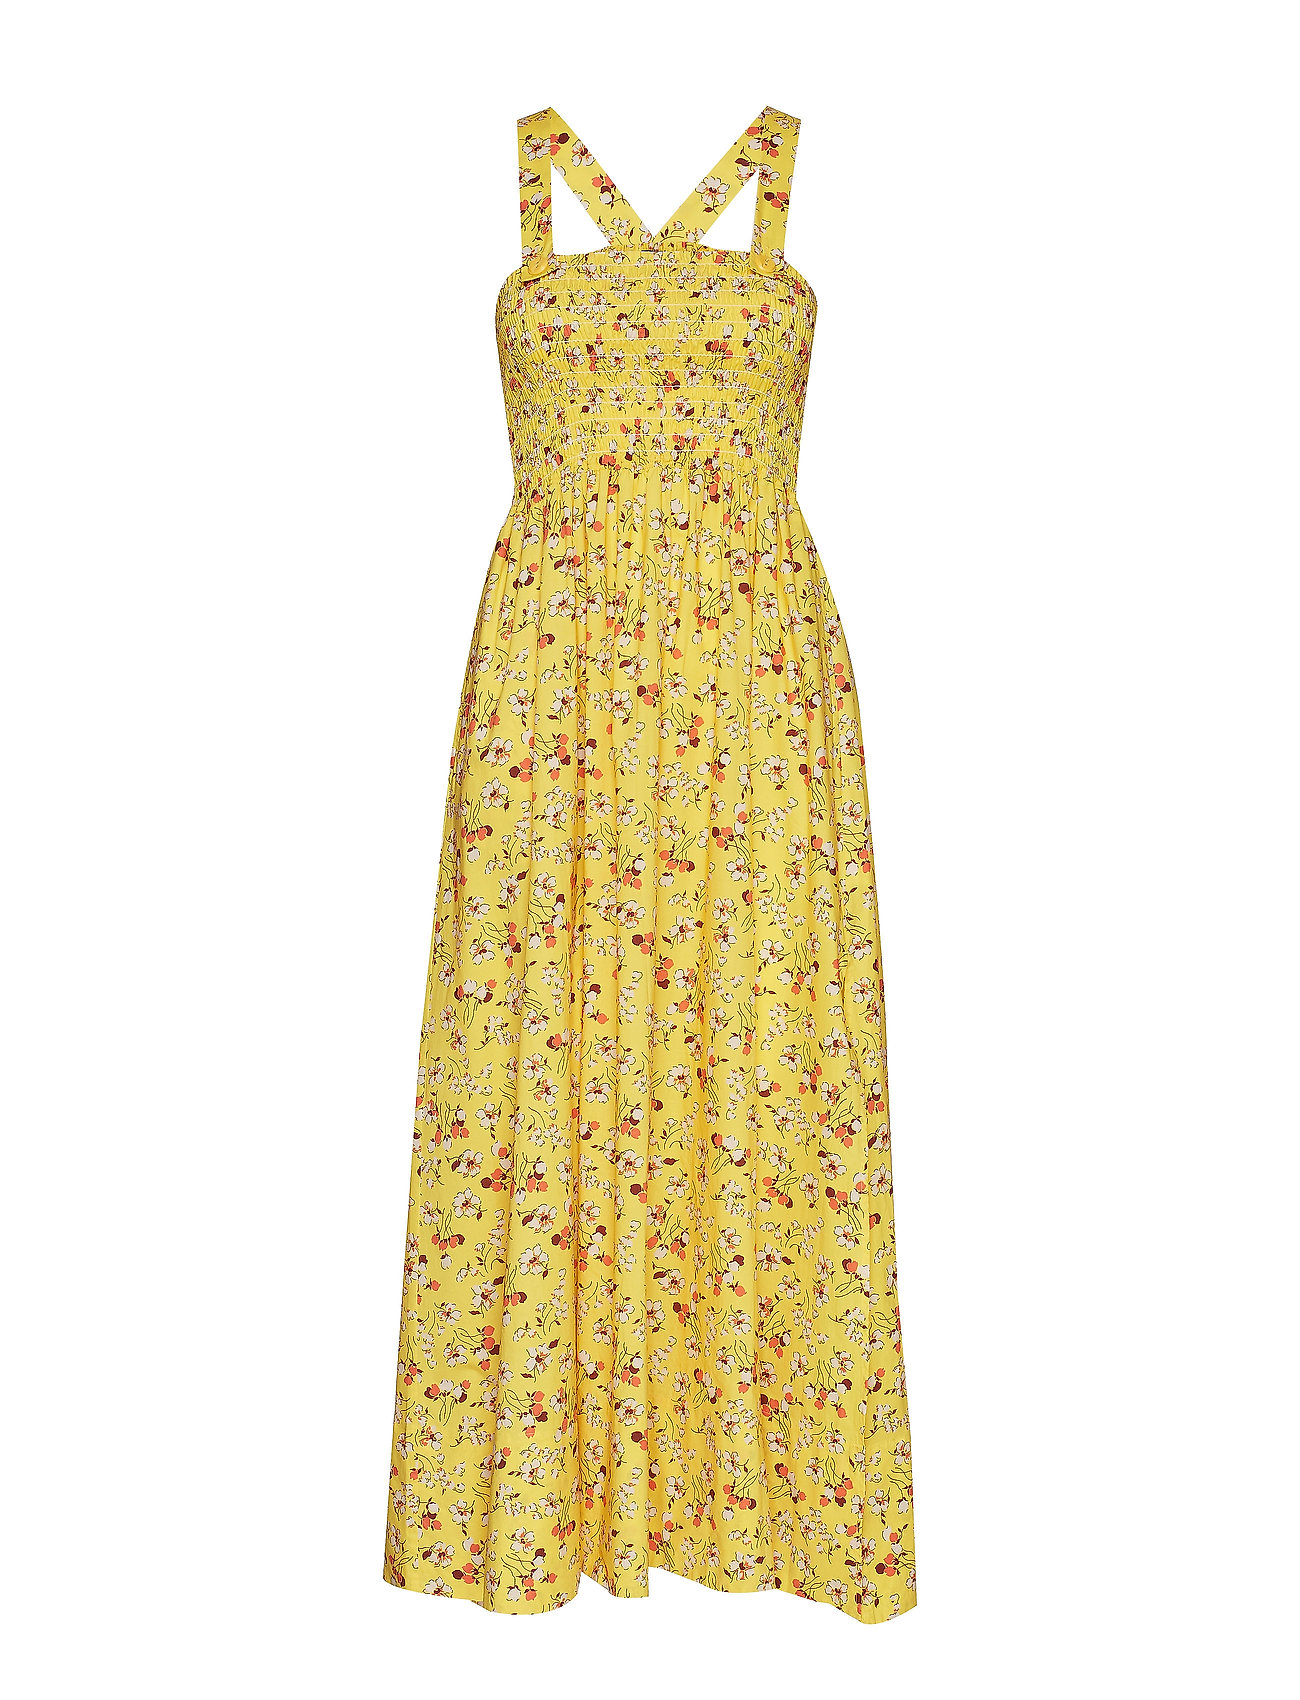 Polo Ralph Lauren Floral Cotton Maxidress